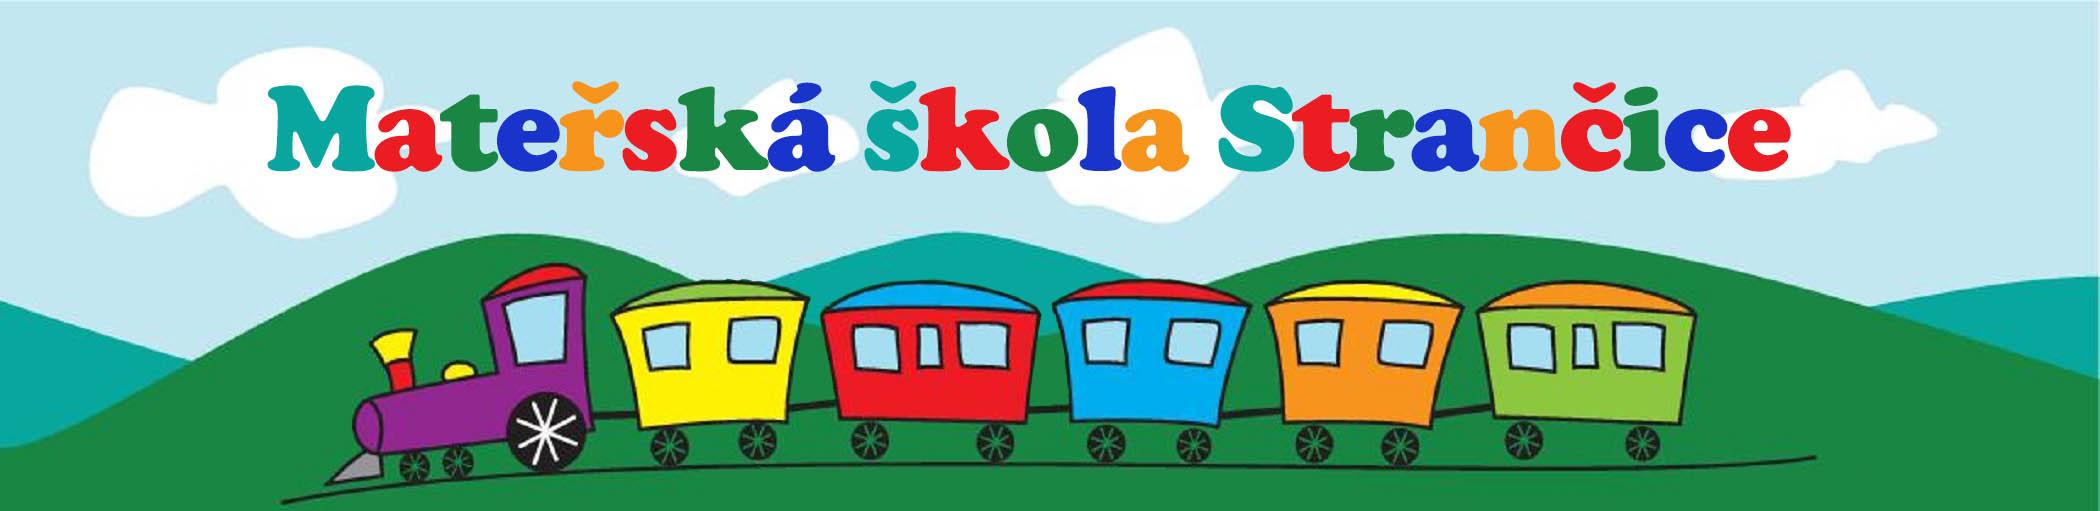 Mateřská škola Strančice logo